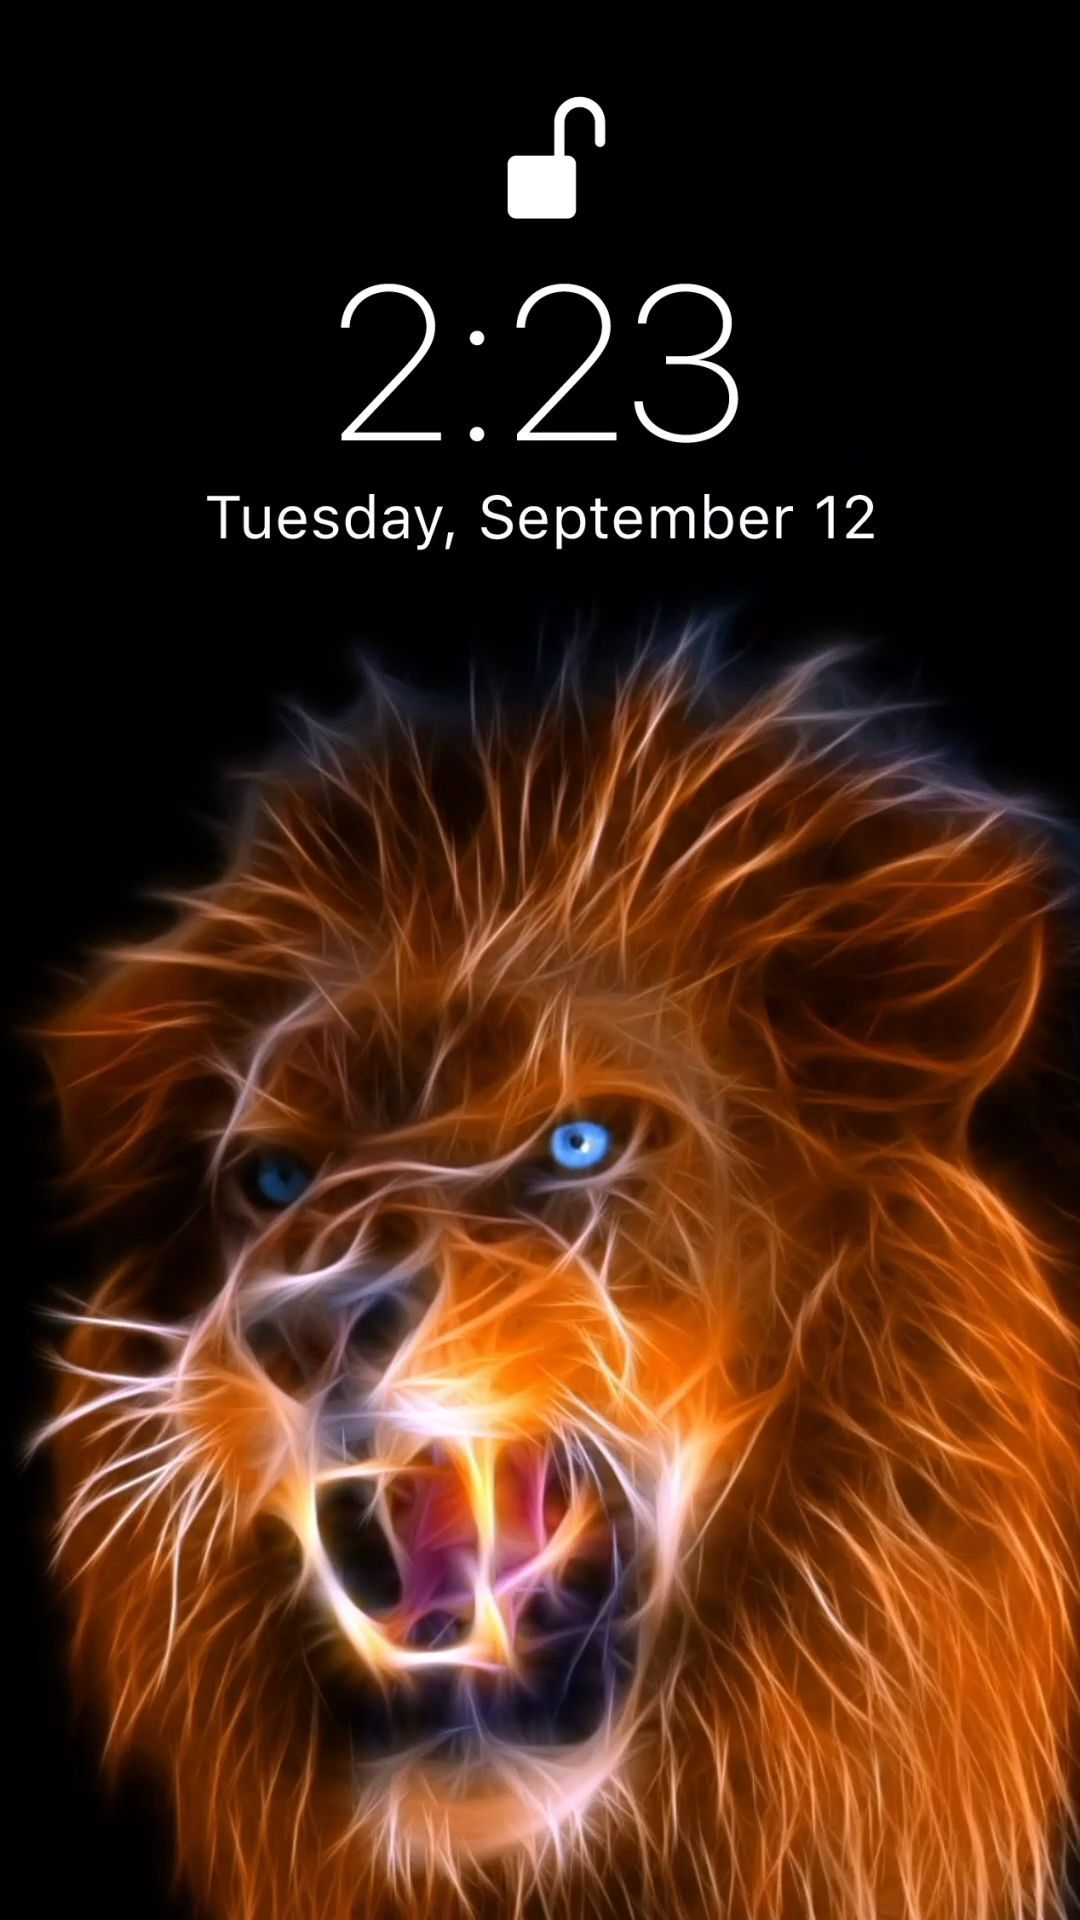 Lion Live Wallpaper , HD Wallpaper & Backgrounds